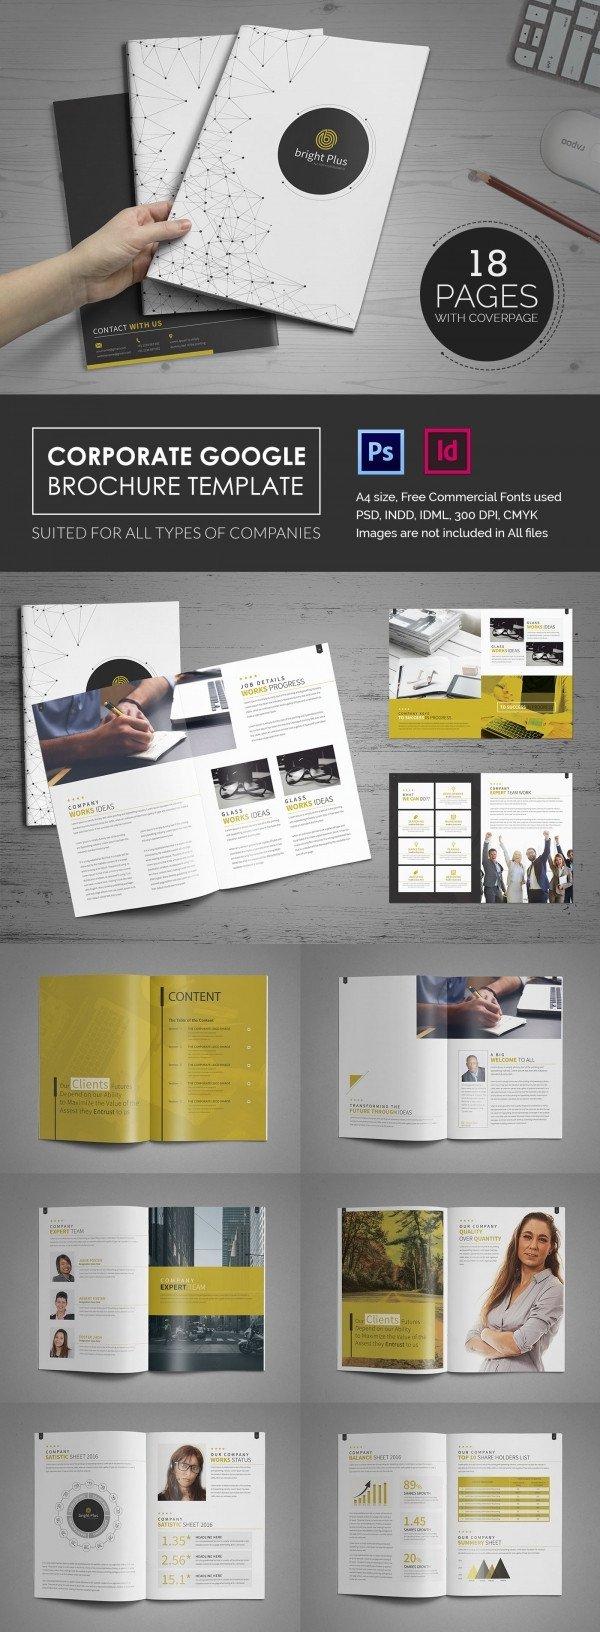 Brochure Template Google Doc 10 Fabulous Google Brochure Templates